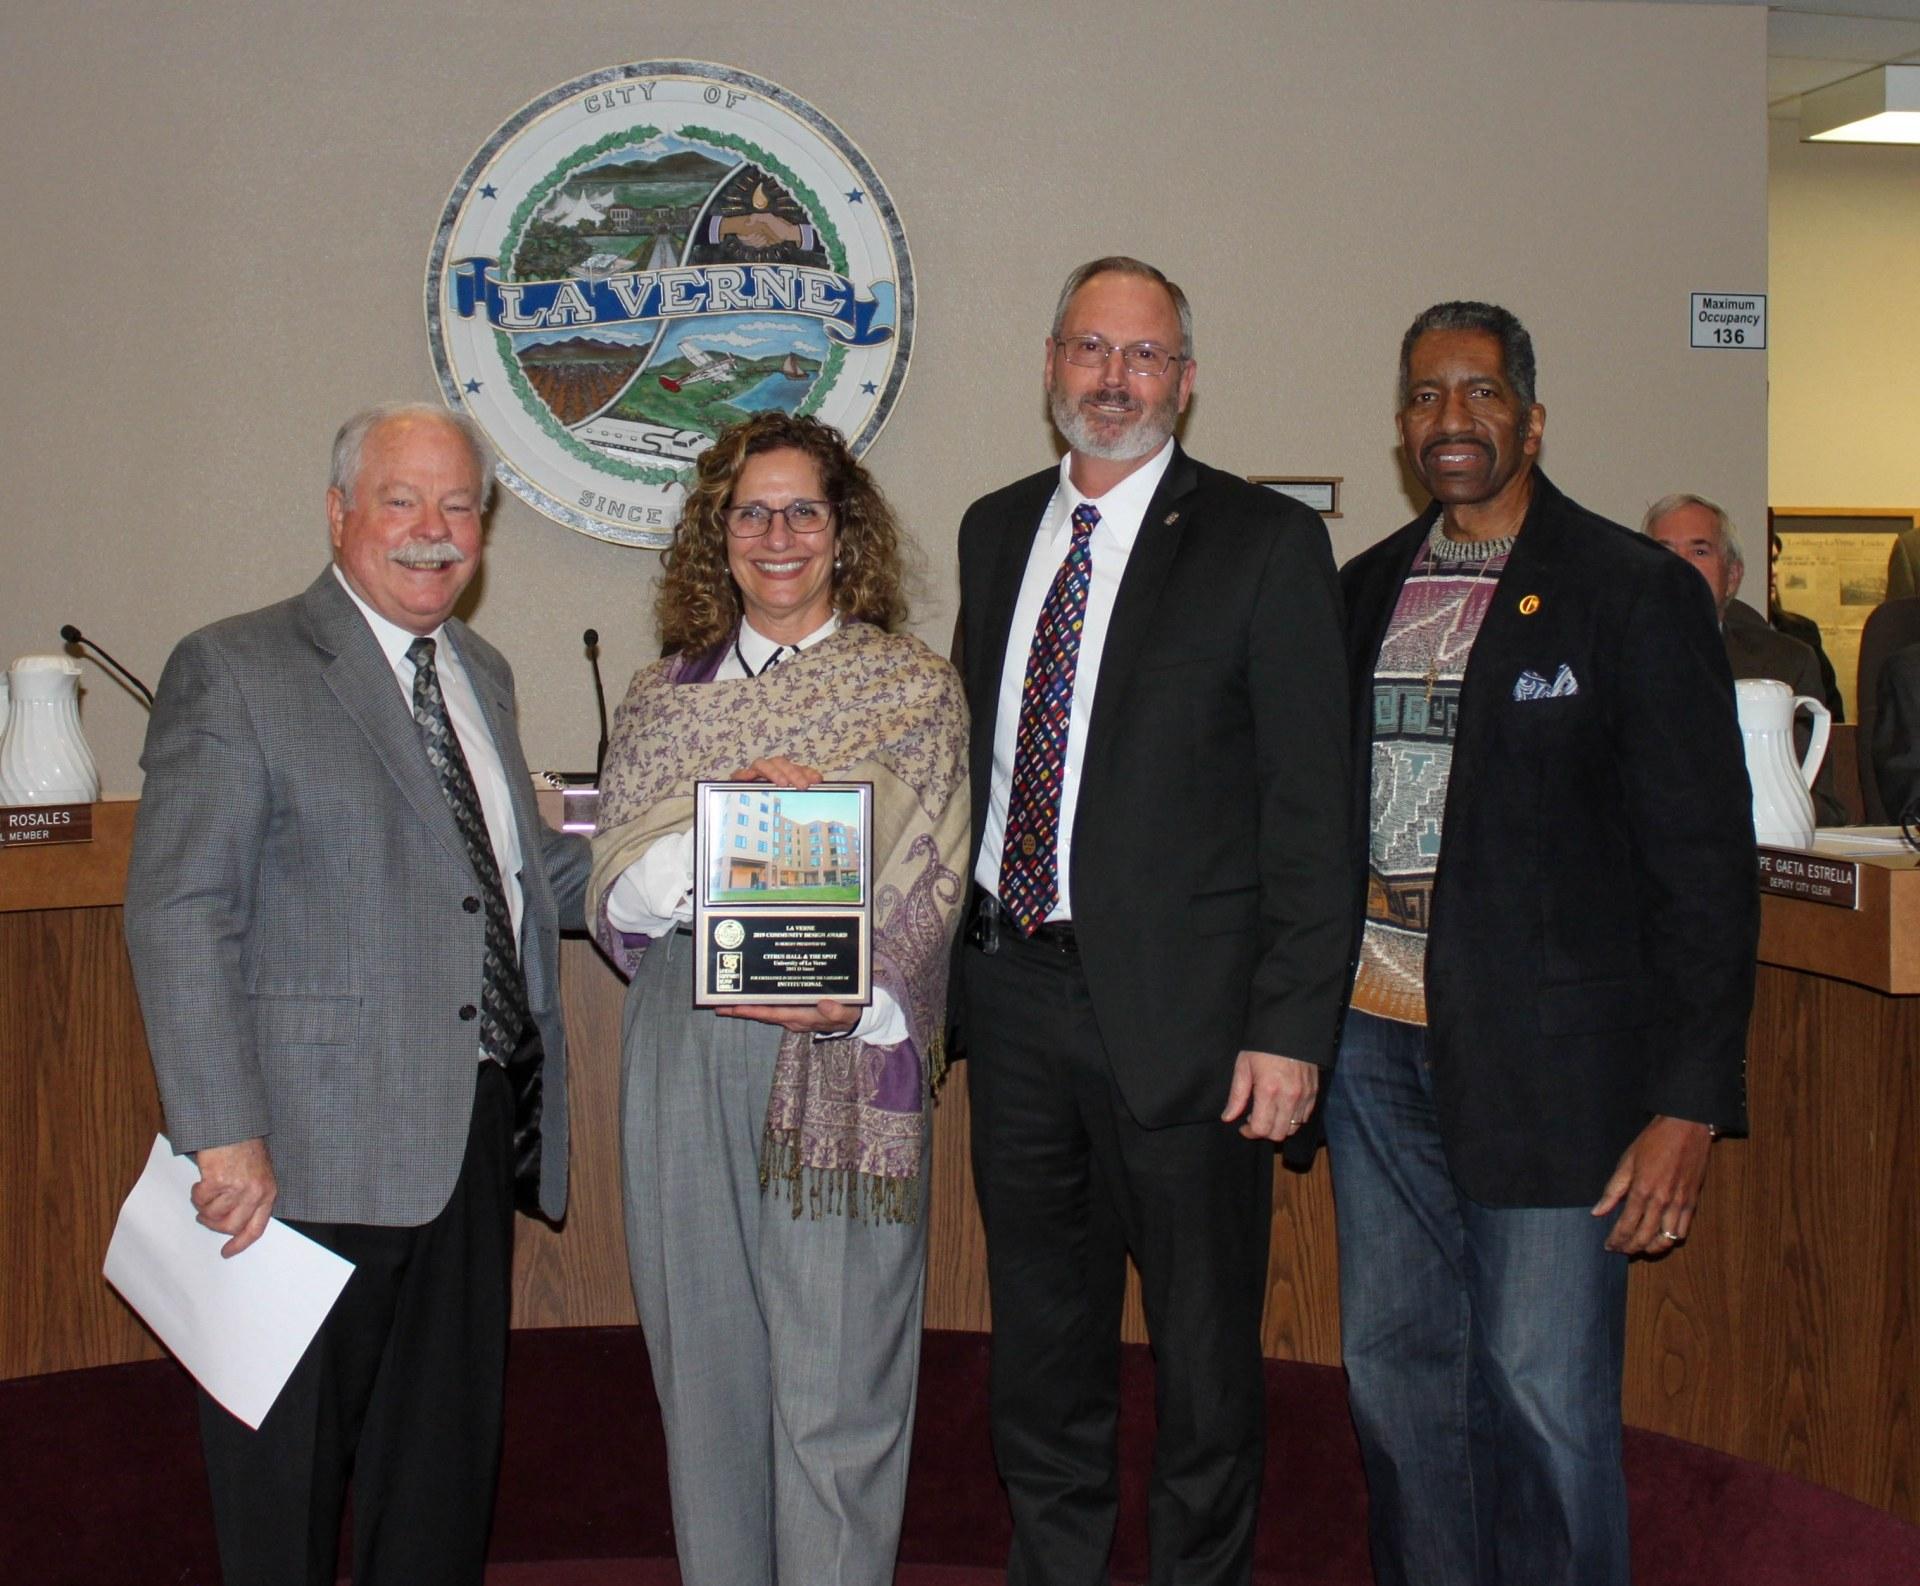 University President Devorah Lieberman poses with City of La Verne award